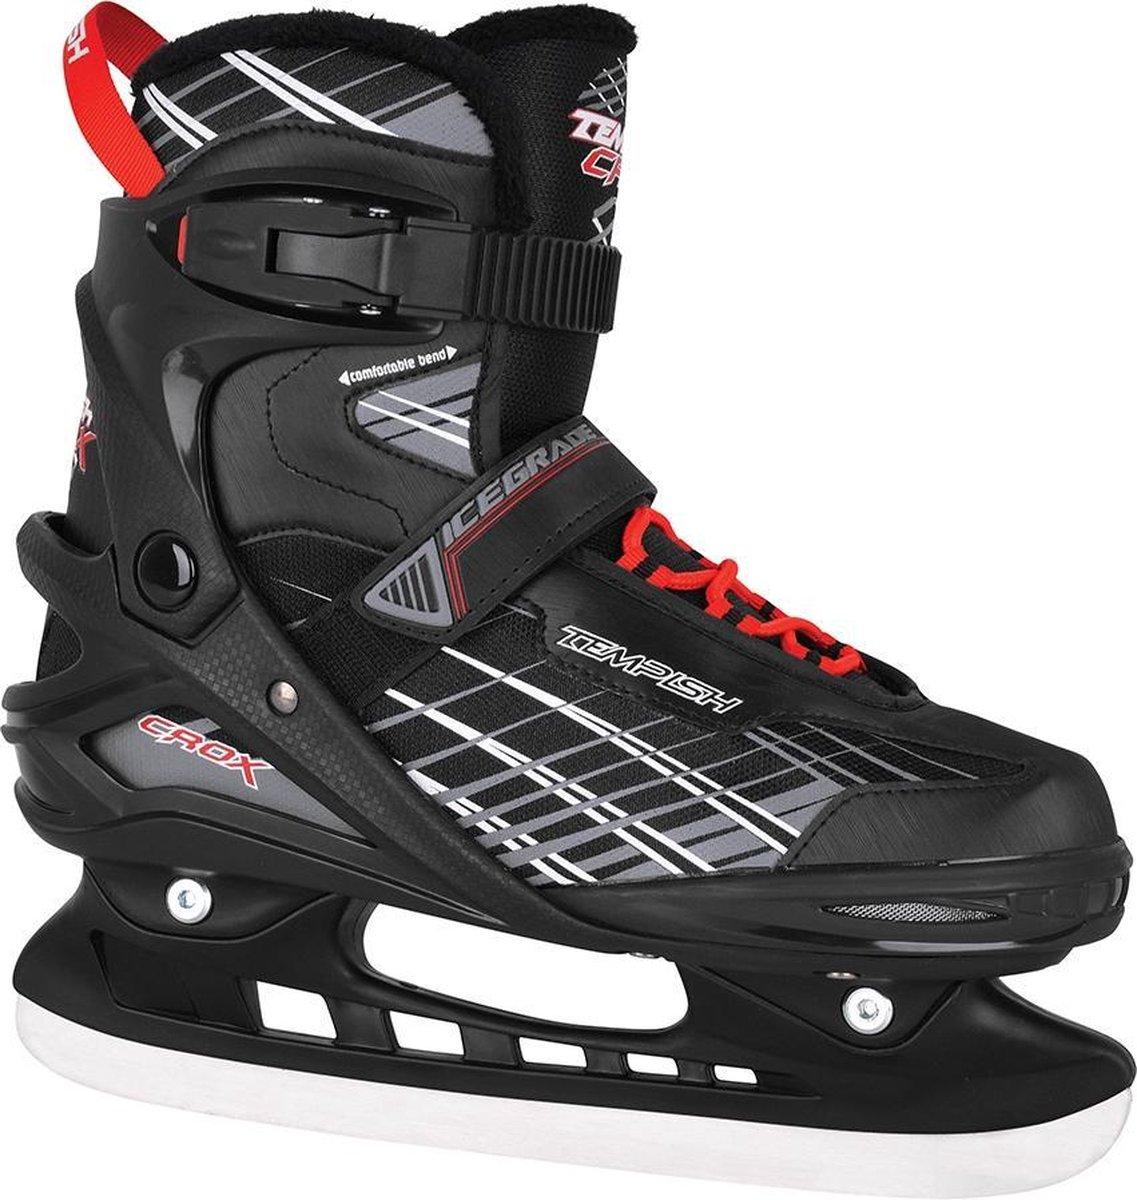 Tempish IJshockeyschaatsen CROX Zwart/Rood 39